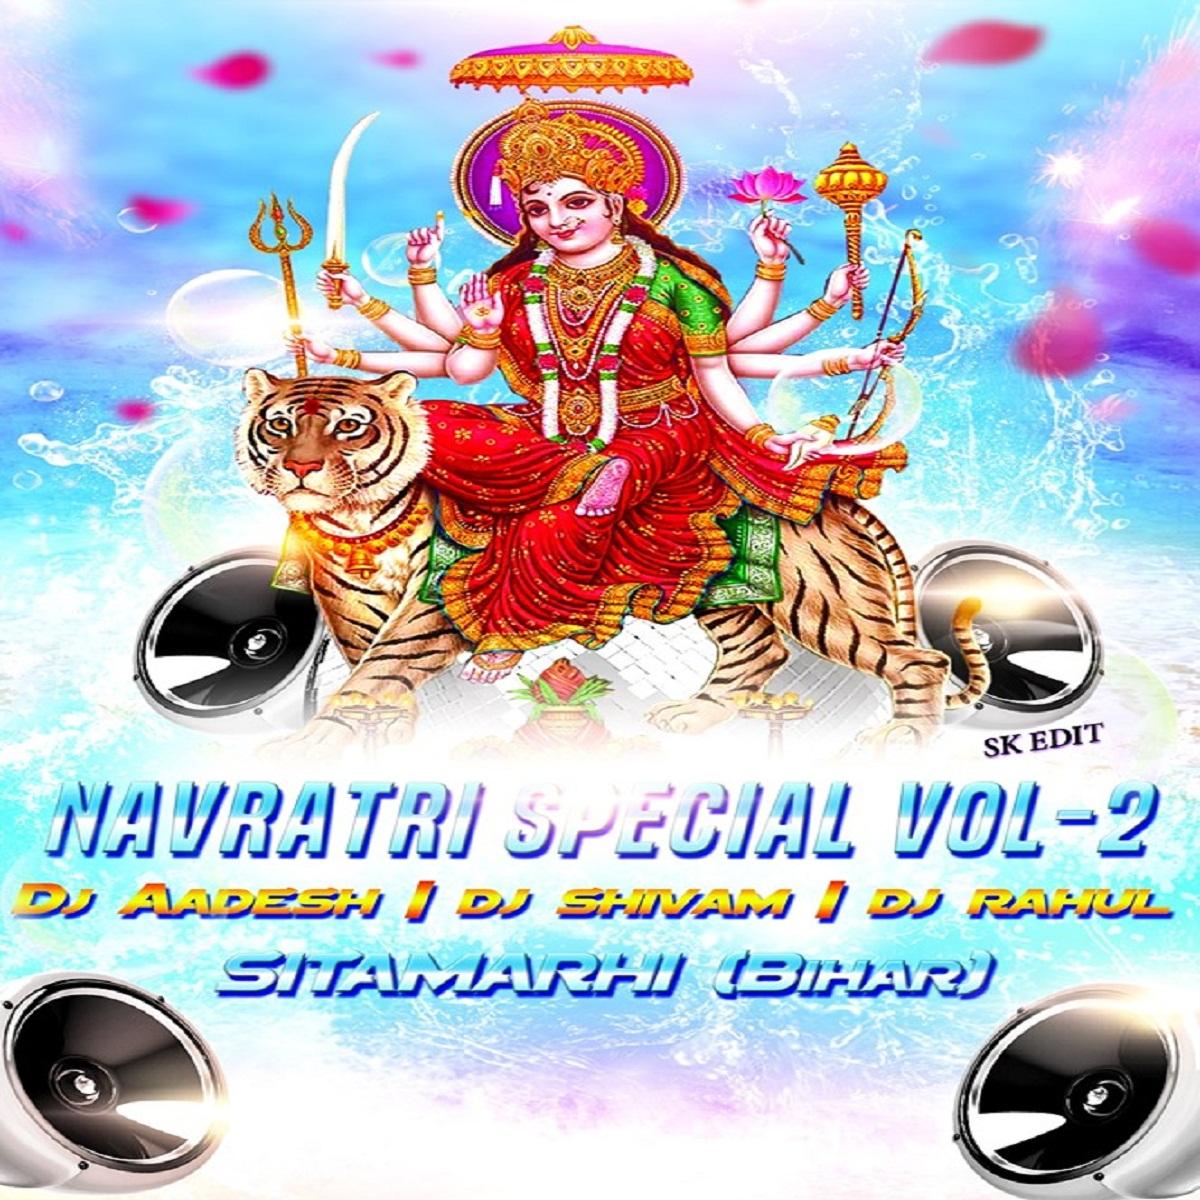 Navratri Special 2019 Vol.02 - DJ AADESH